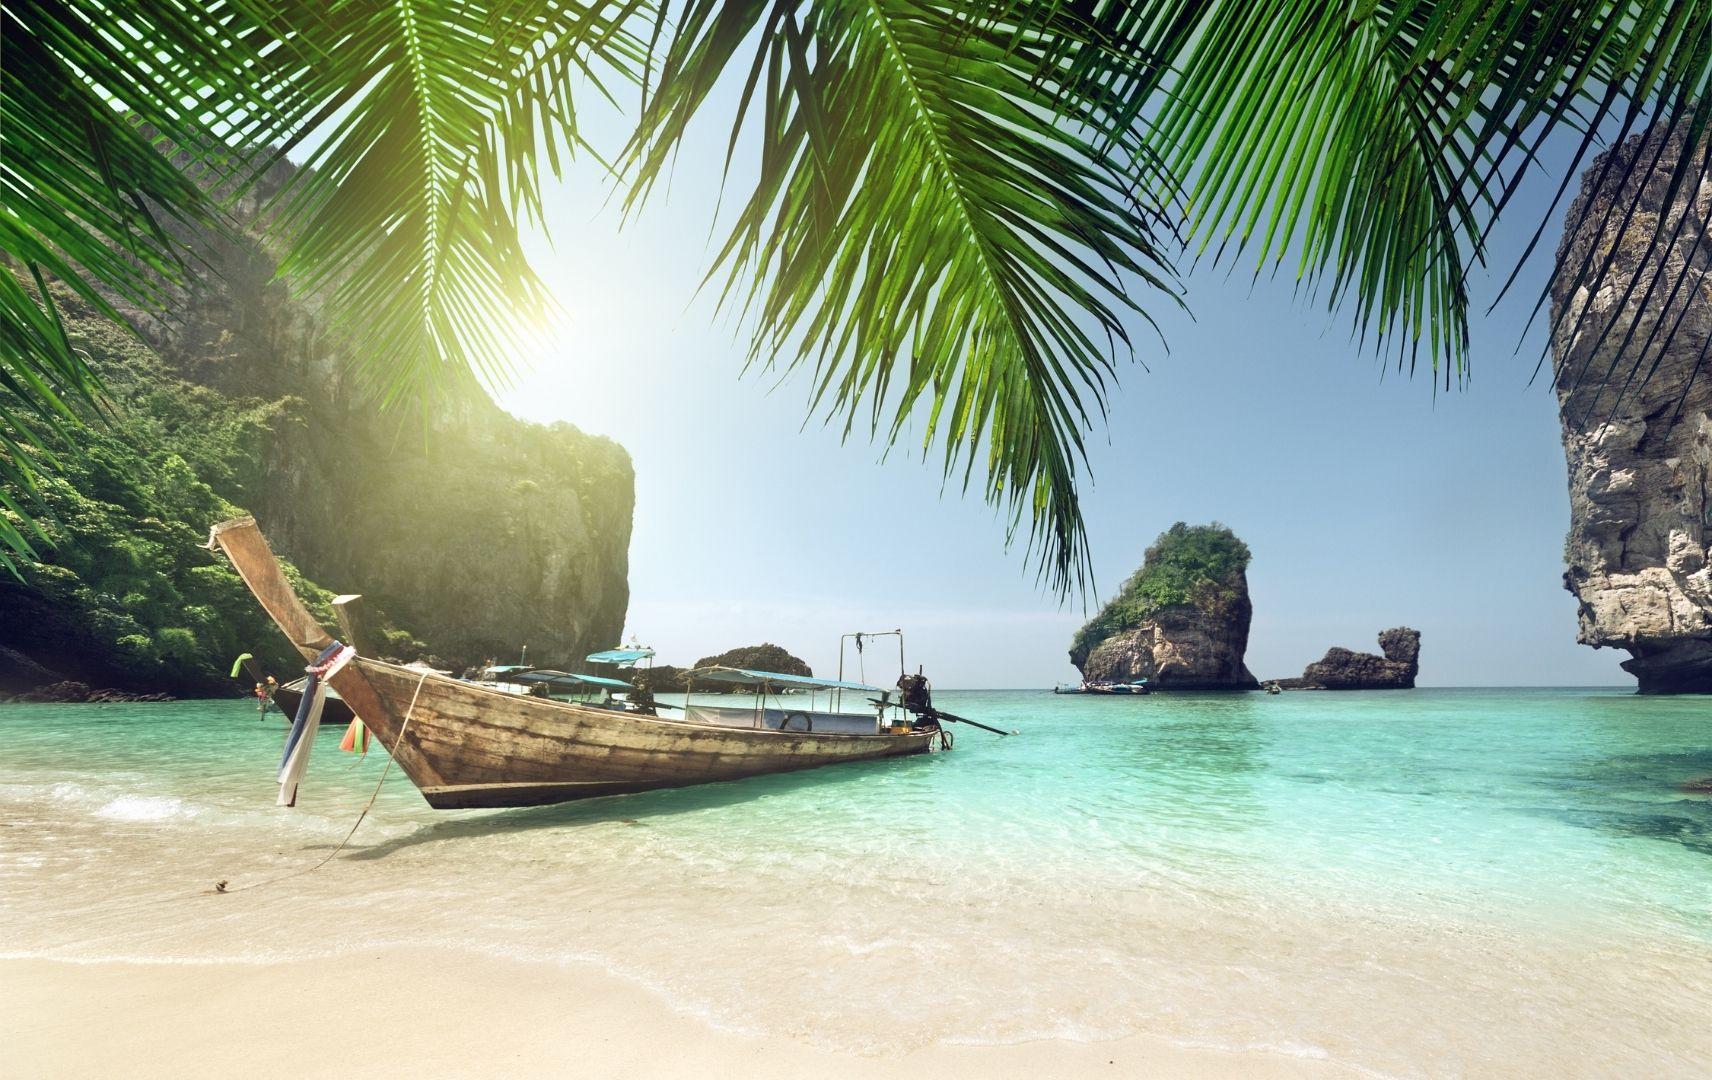 Fernreise - Thailand Strand